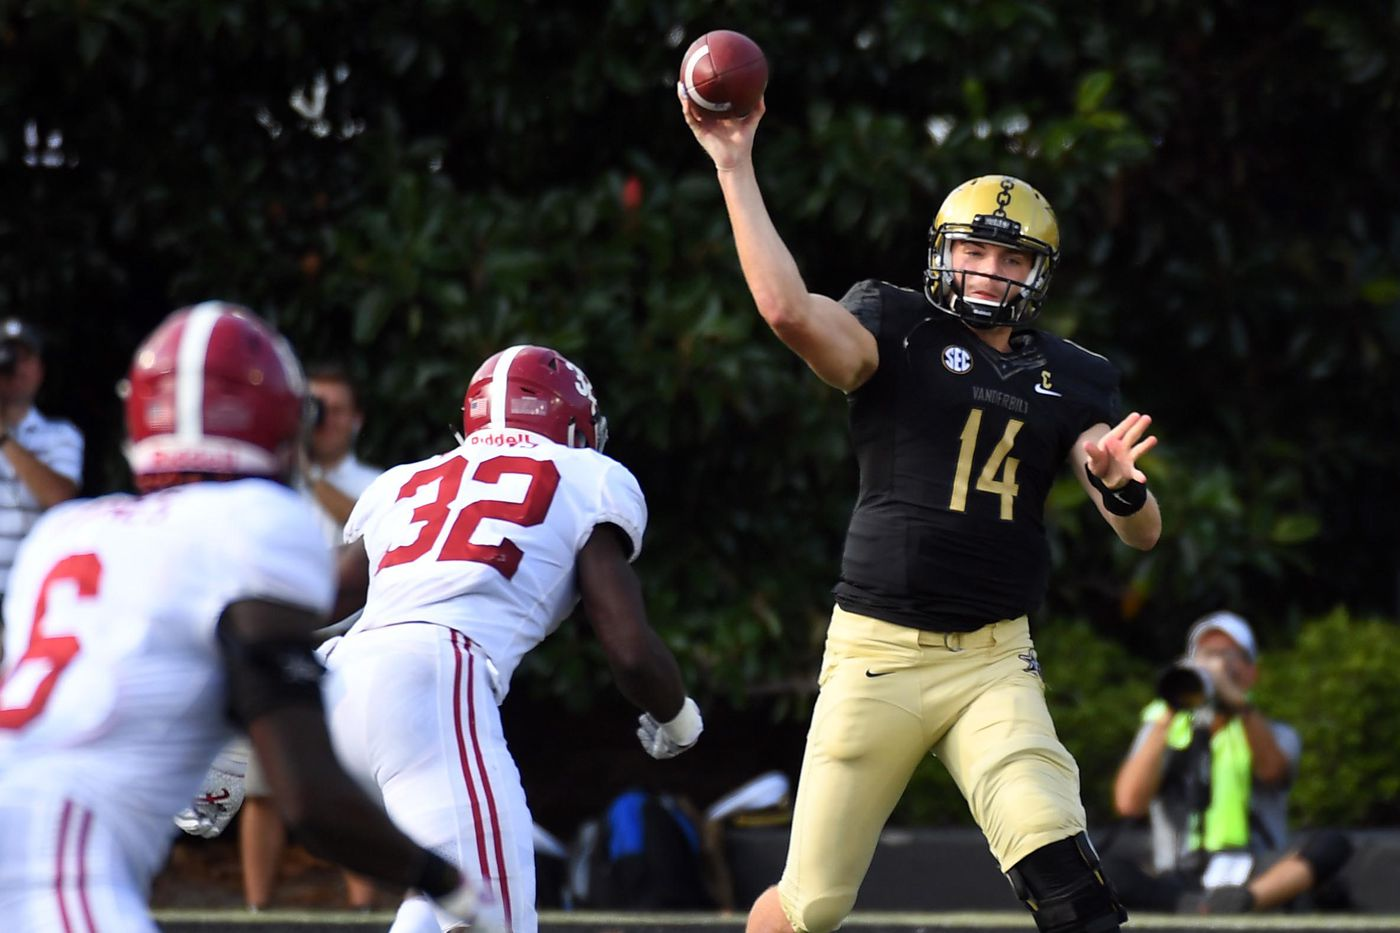 Vanderbilt Vs Florida Live Stream Start Time How To Watch Online SBNation com